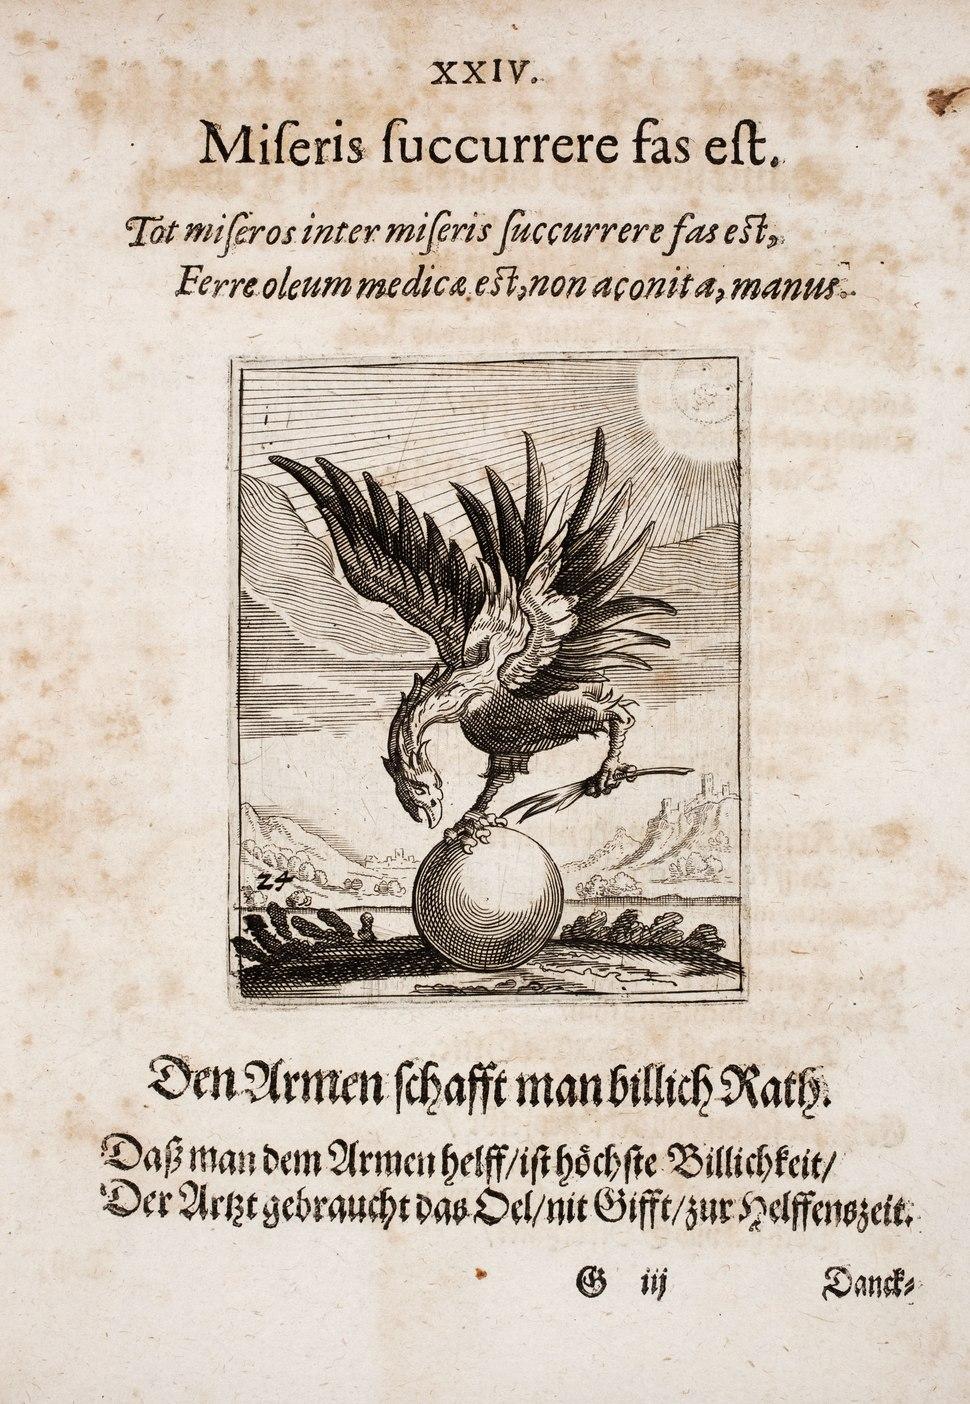 Johann-Vogel-Meditationes-emblematicae-de-restaurata-pace-Germaniae MGG 1034